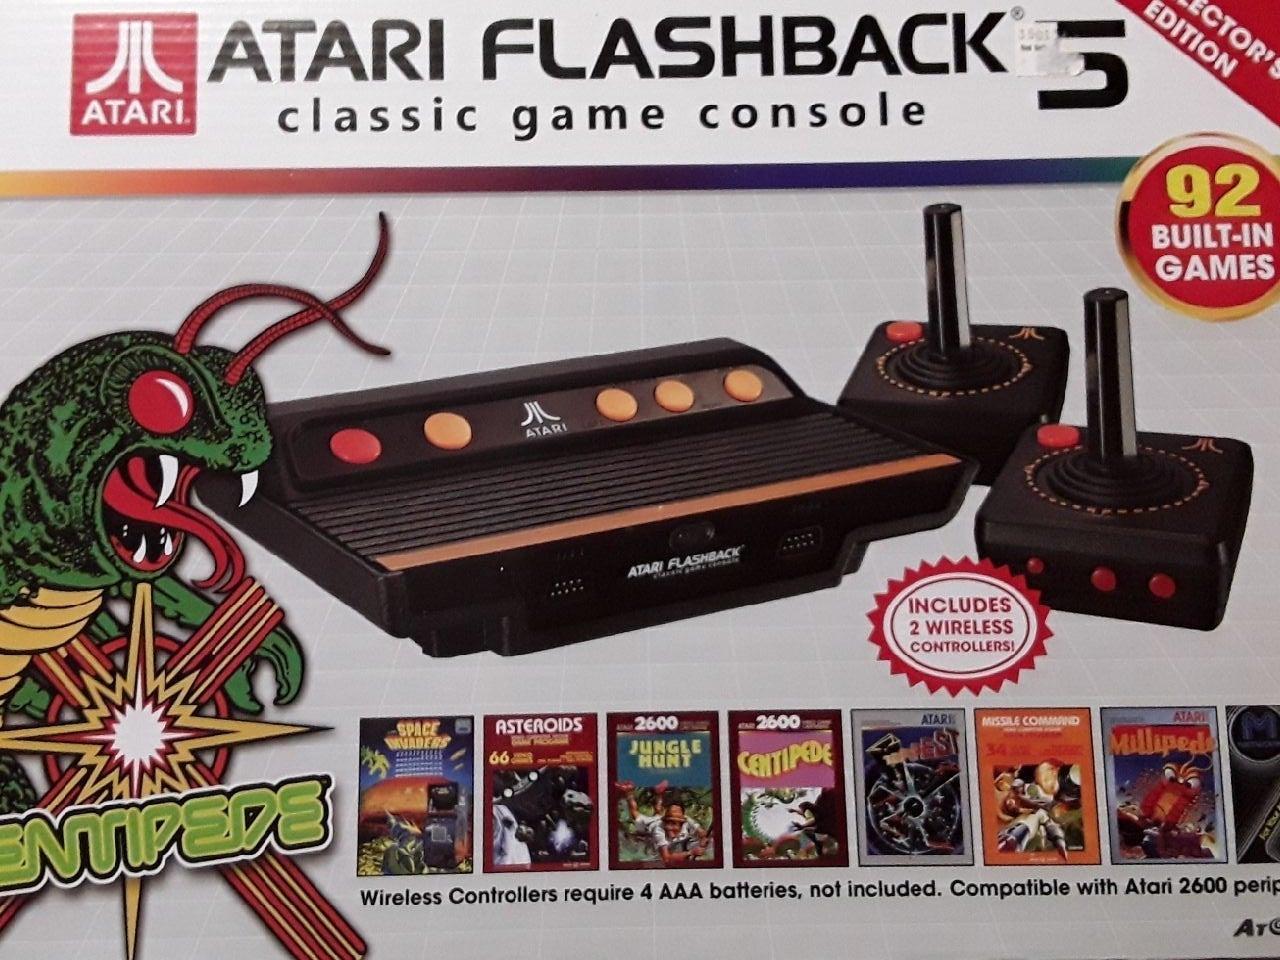 Atari Flashback 5 Classic Game Console